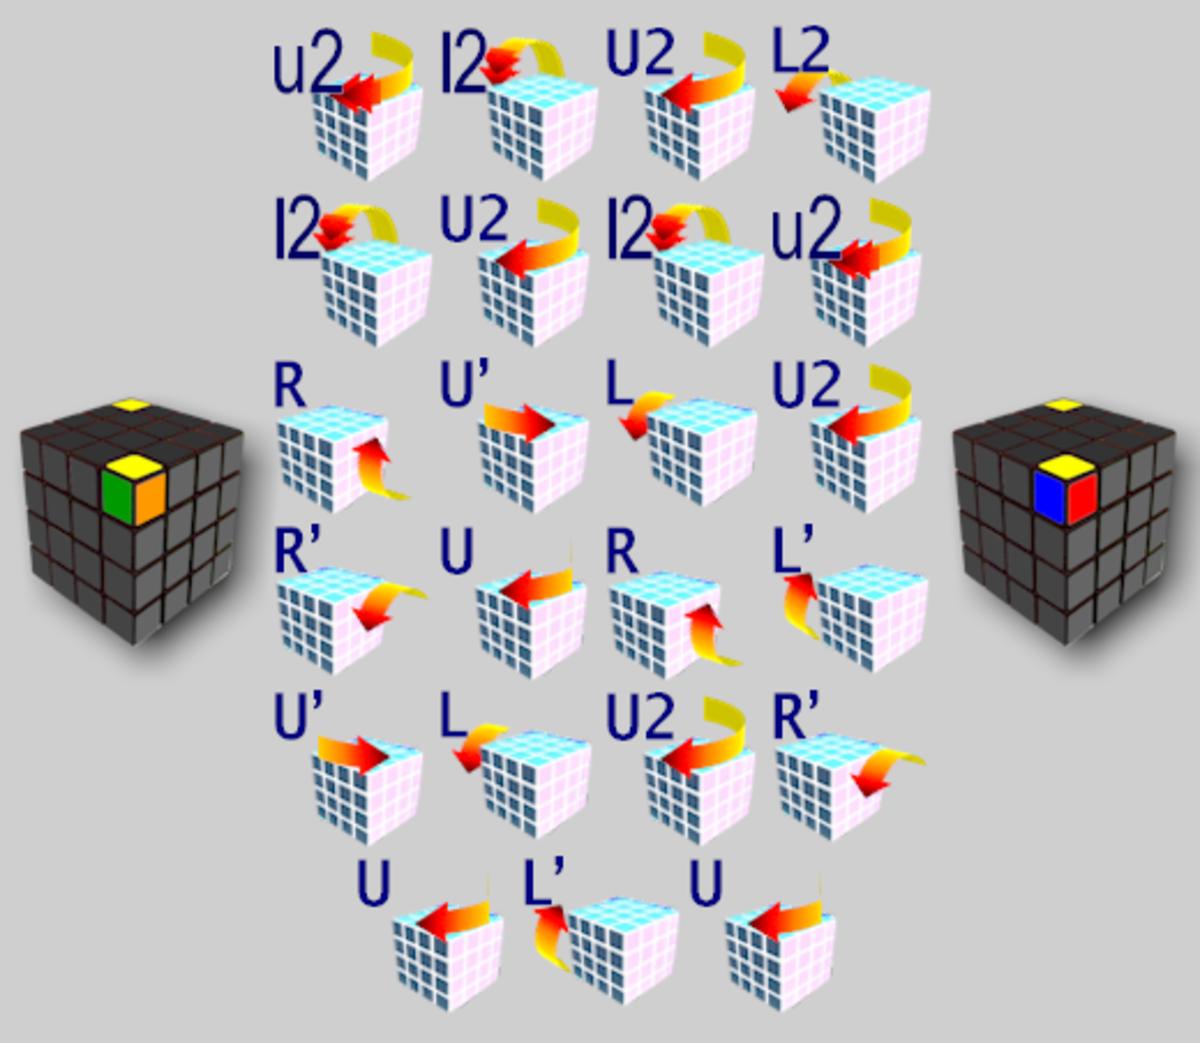 u2 - l2 - U2 - L2 - l2 - U2 - l2 - u2 - R - U' - L - U2 - R' - U - R - L' - U' - L - U2 - R' - U - L' - U